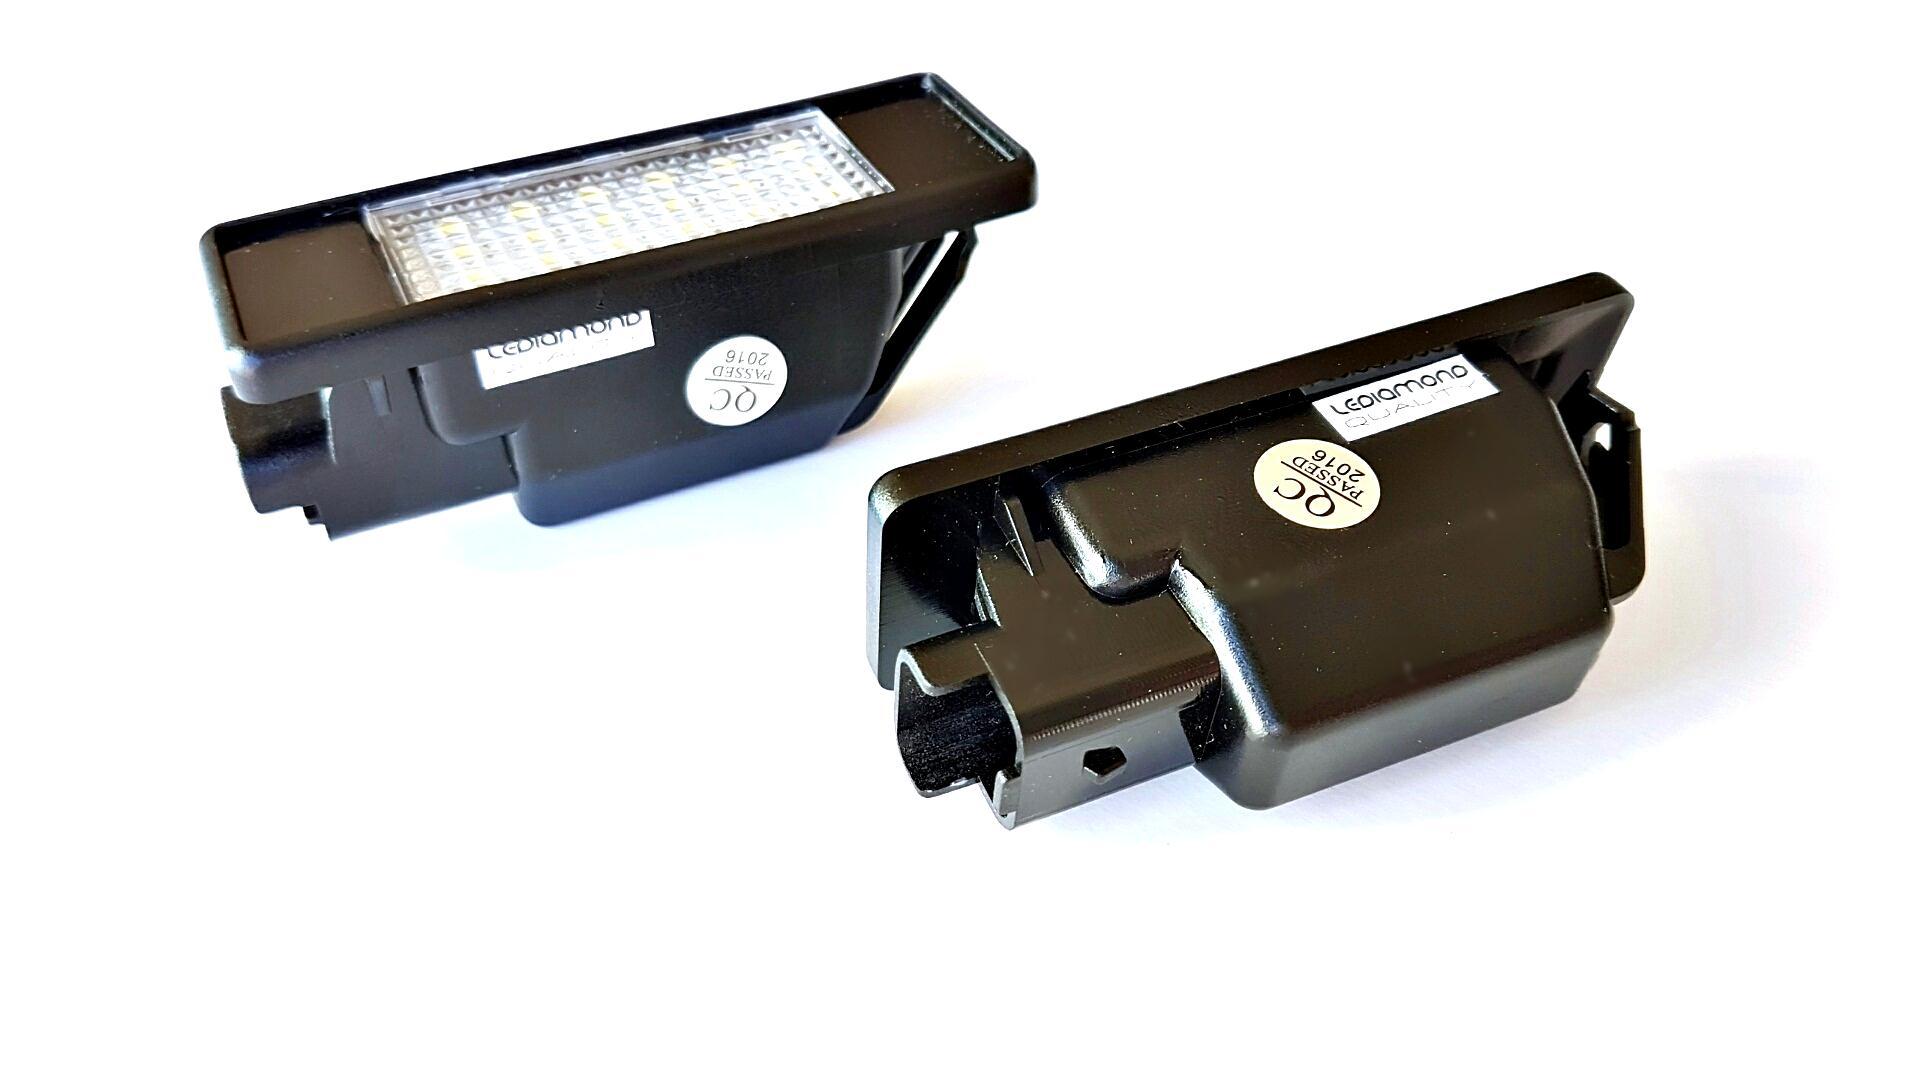 PLAFONES LED MERCEDES BENZ LMD030217 C